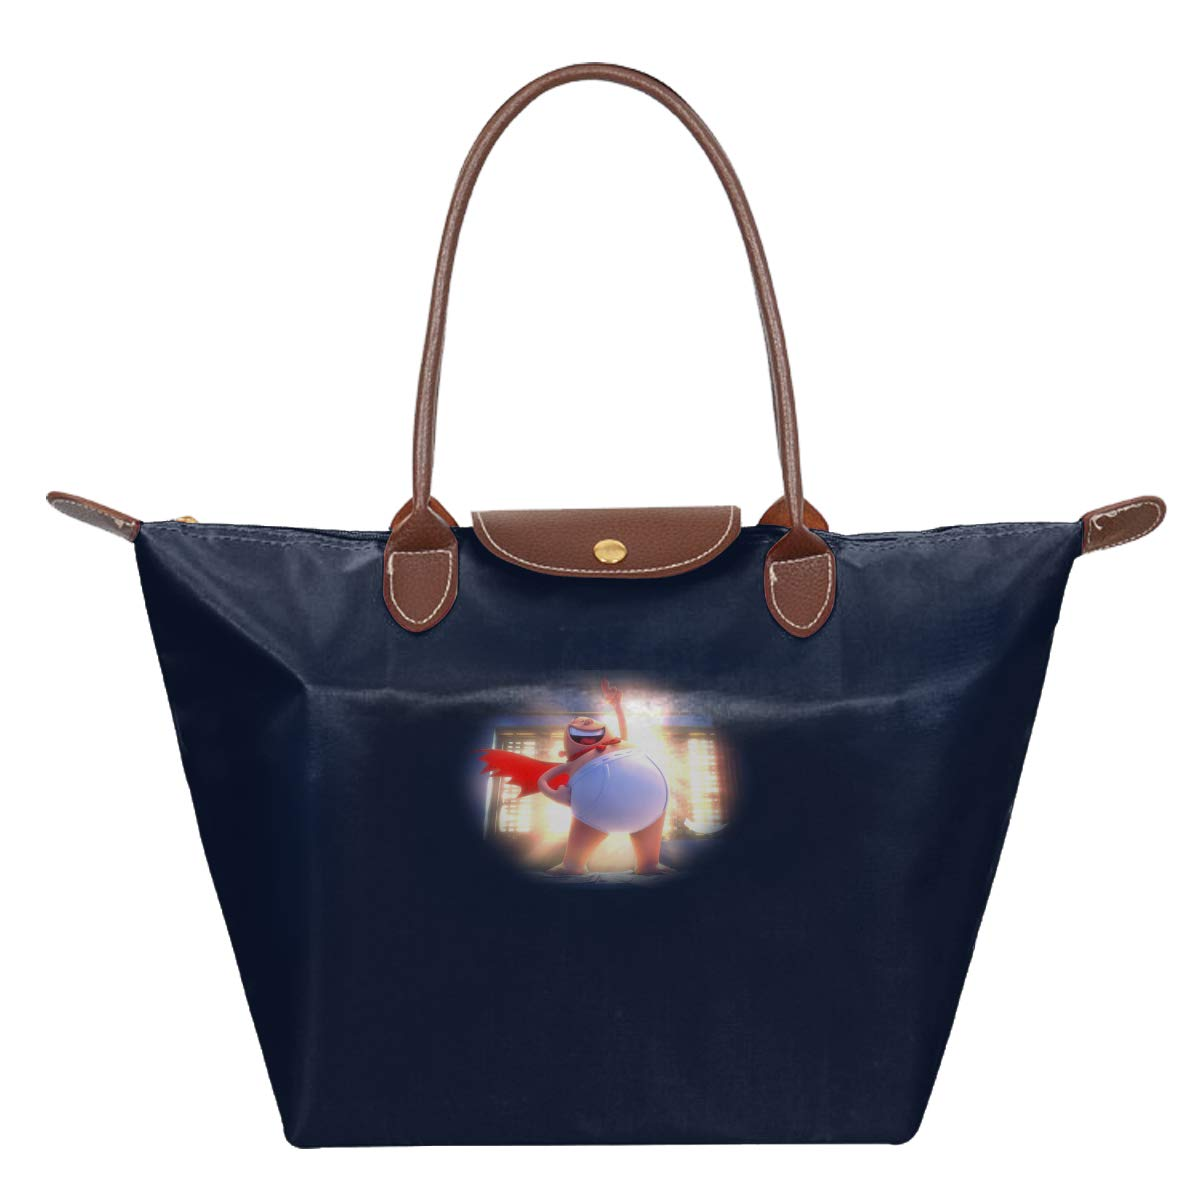 Captain Underpants Waterproof Leather Folded Messenger Nylon Bag Travel Tote Hopping Folding School Handbags